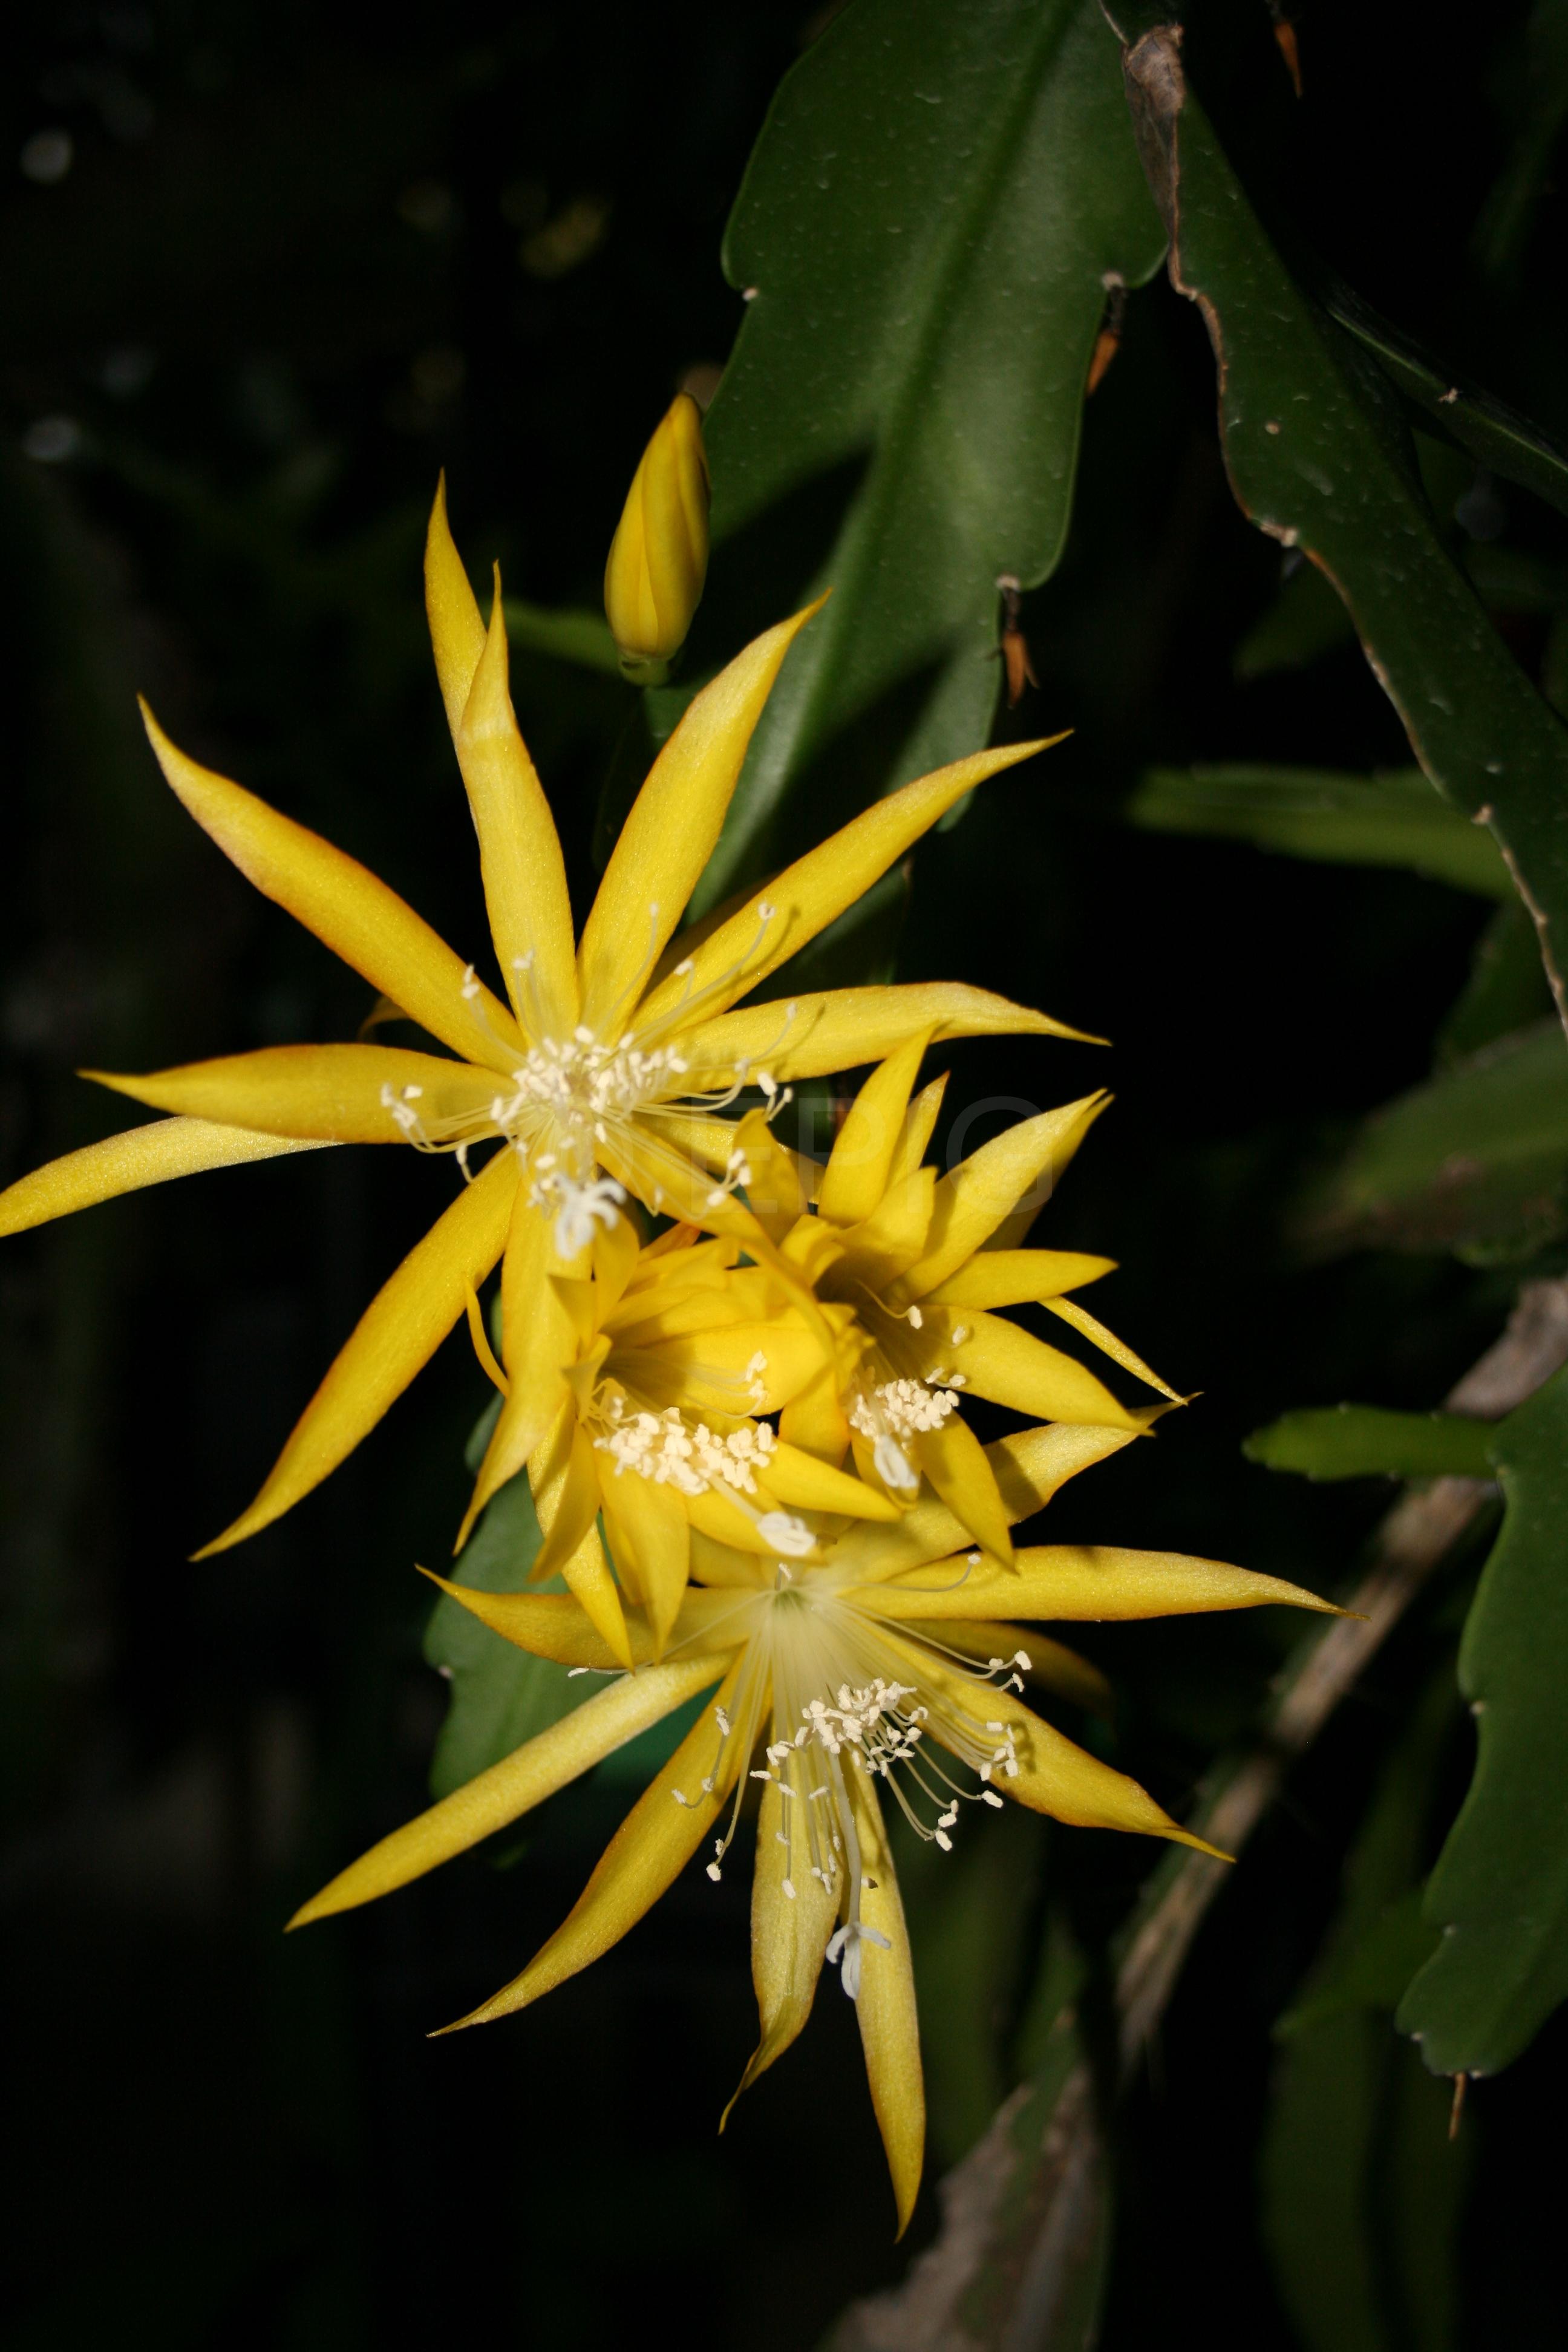 Epikaktus 'Yellow Paetz' (Foto Walter Widmann)